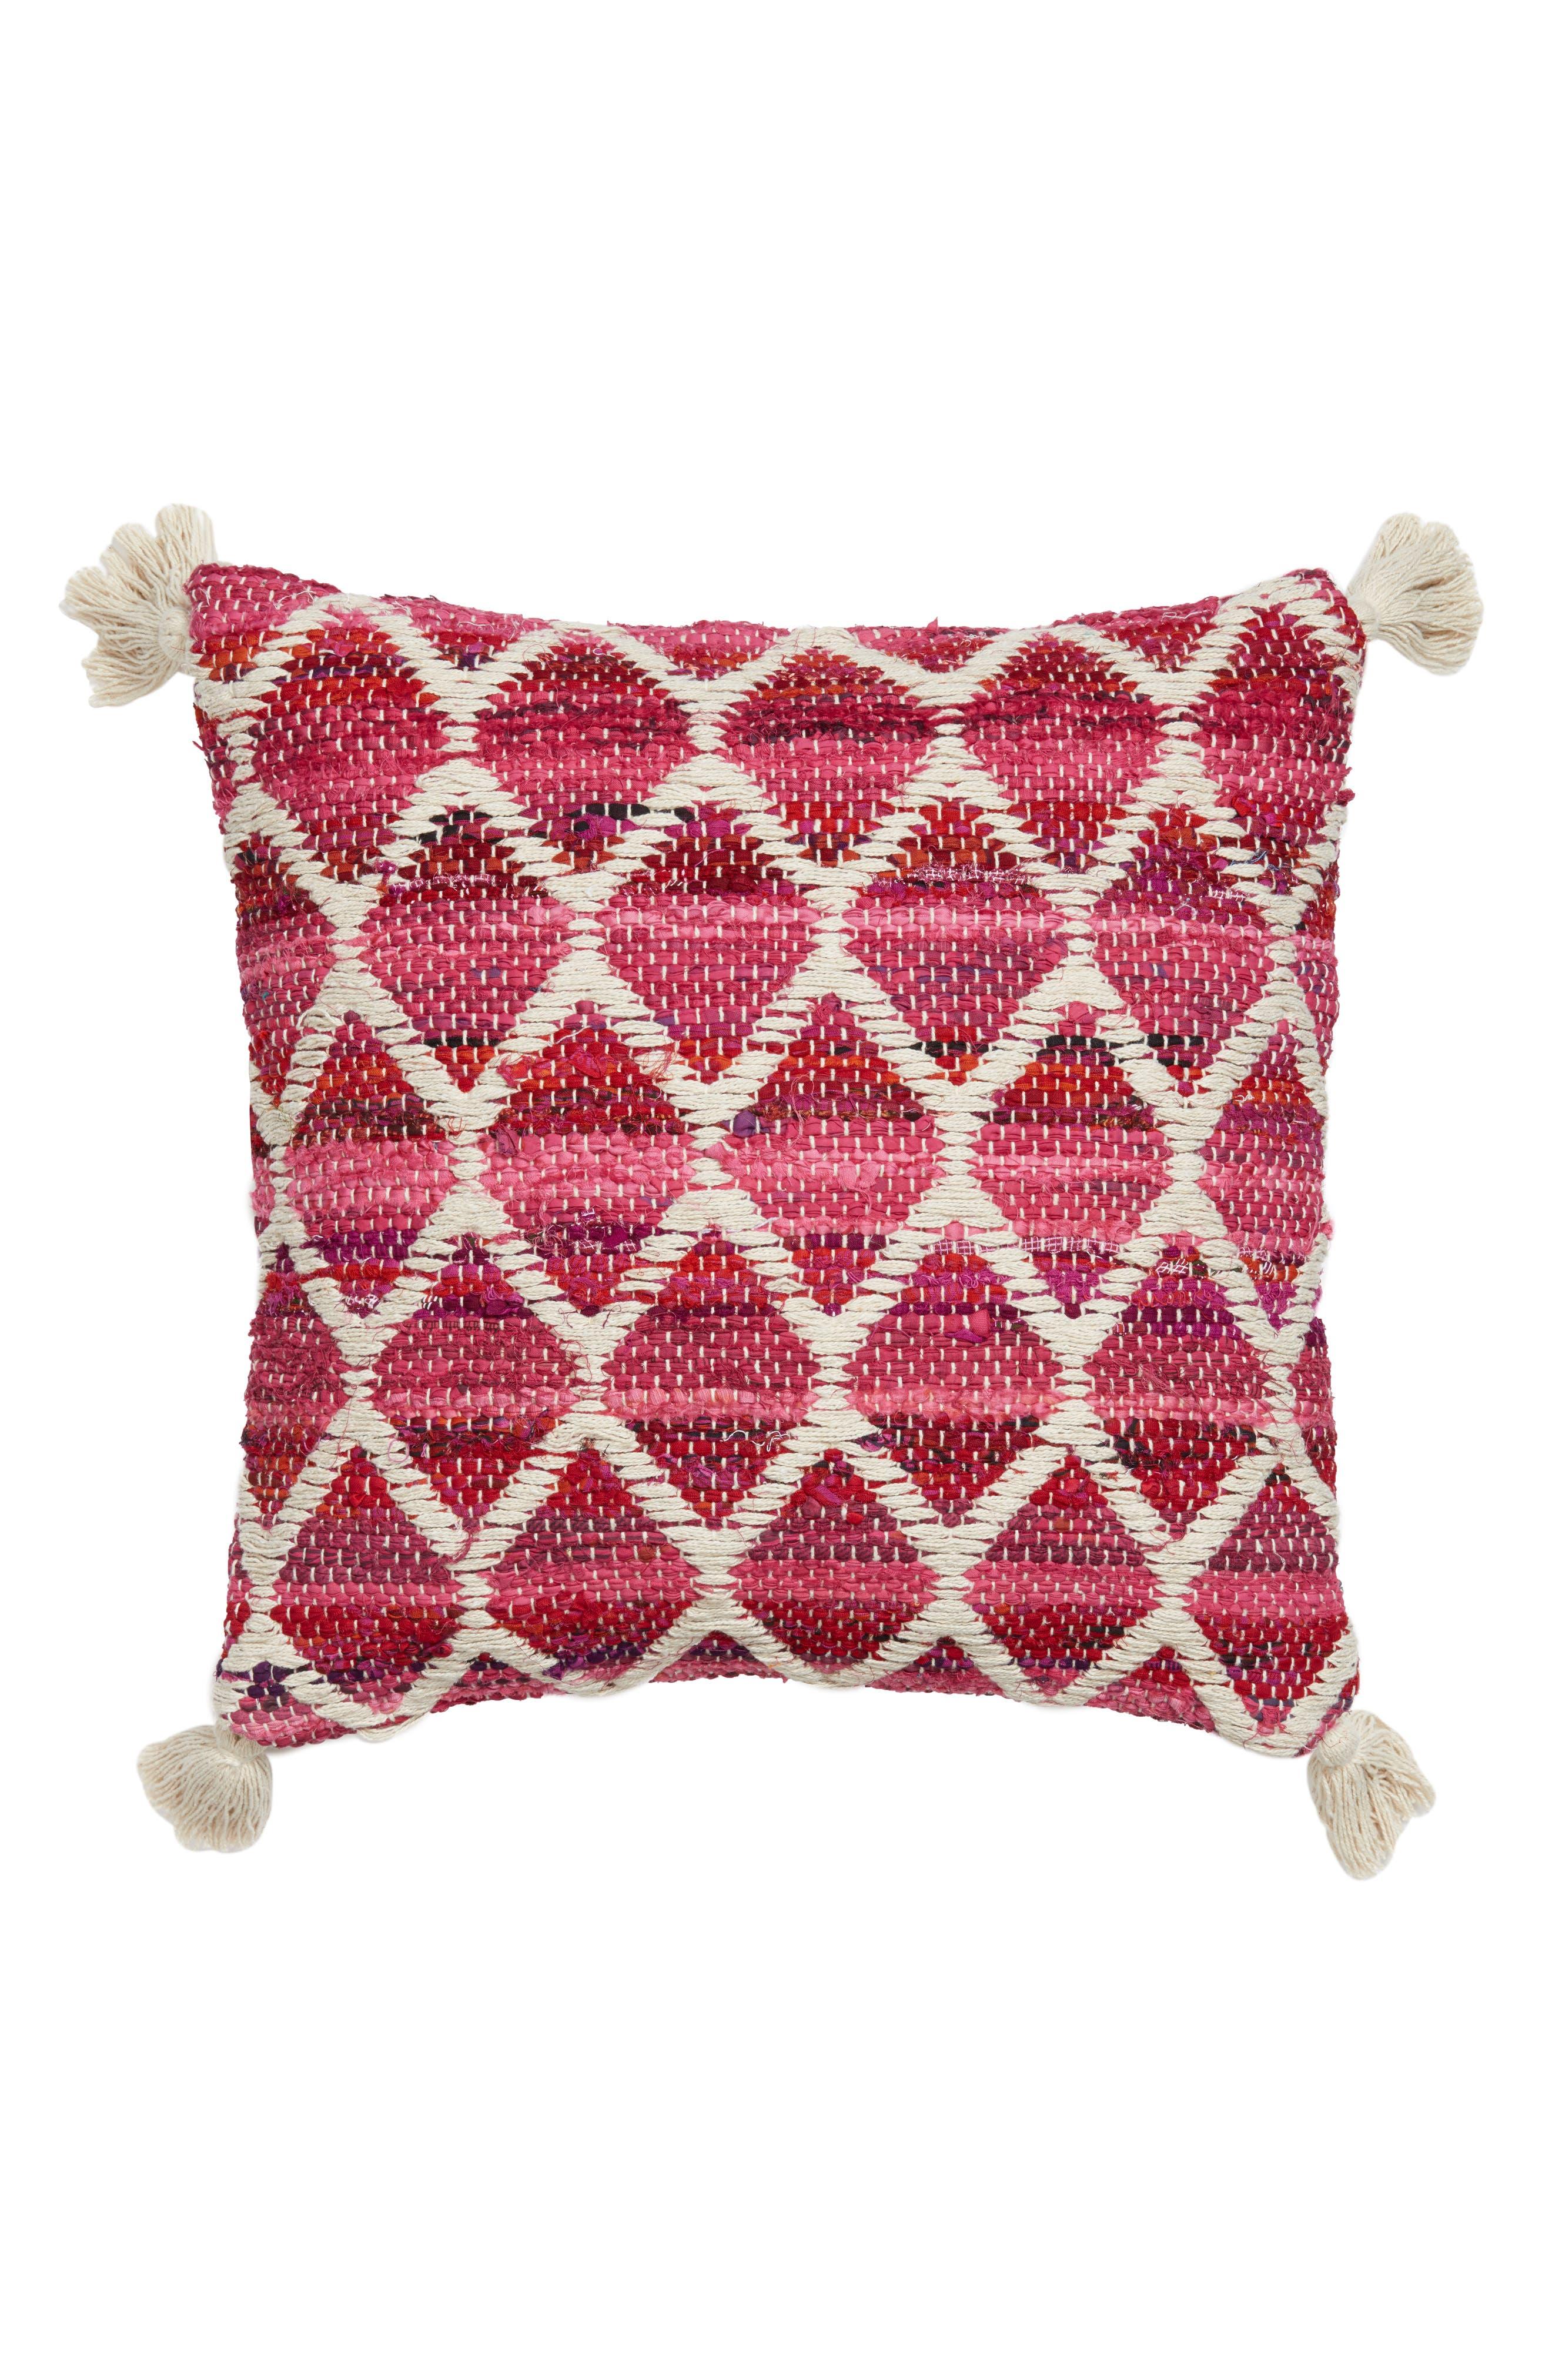 BRENTWOOD ORIGINALS,                             Diamond Chindi Accent Pillow,                             Main thumbnail 1, color,                             671